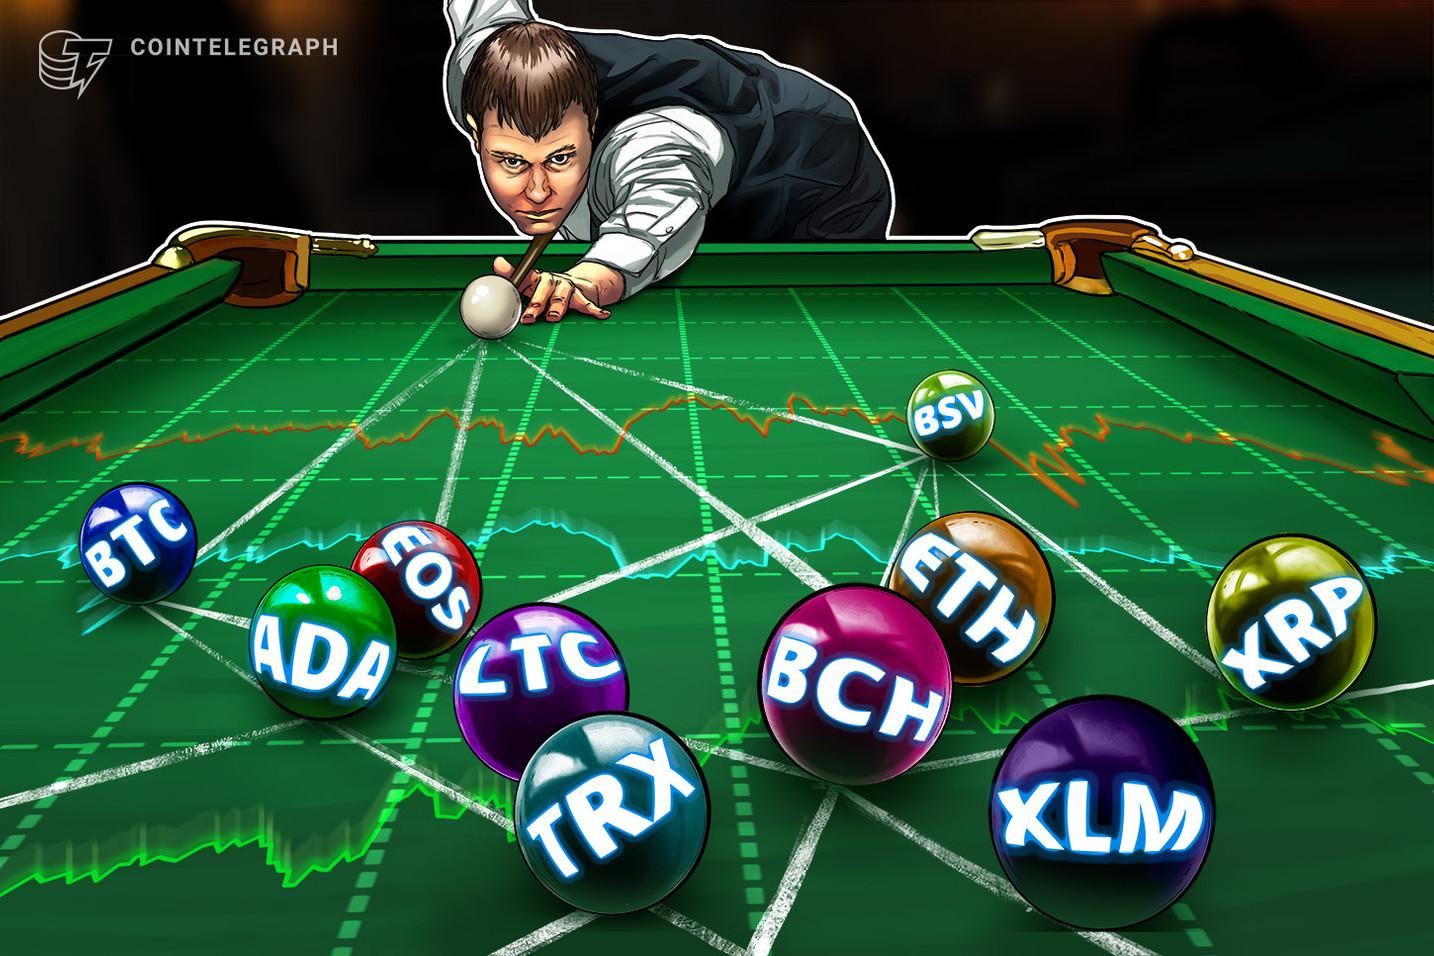 Bitcoin, Ethereum, Ripple, Bitcoin Cash, EOS, Litecoin, Stellar, Tron, Bitcoin SV, Cardano: Analisi dei prezzi, 9 gennaio